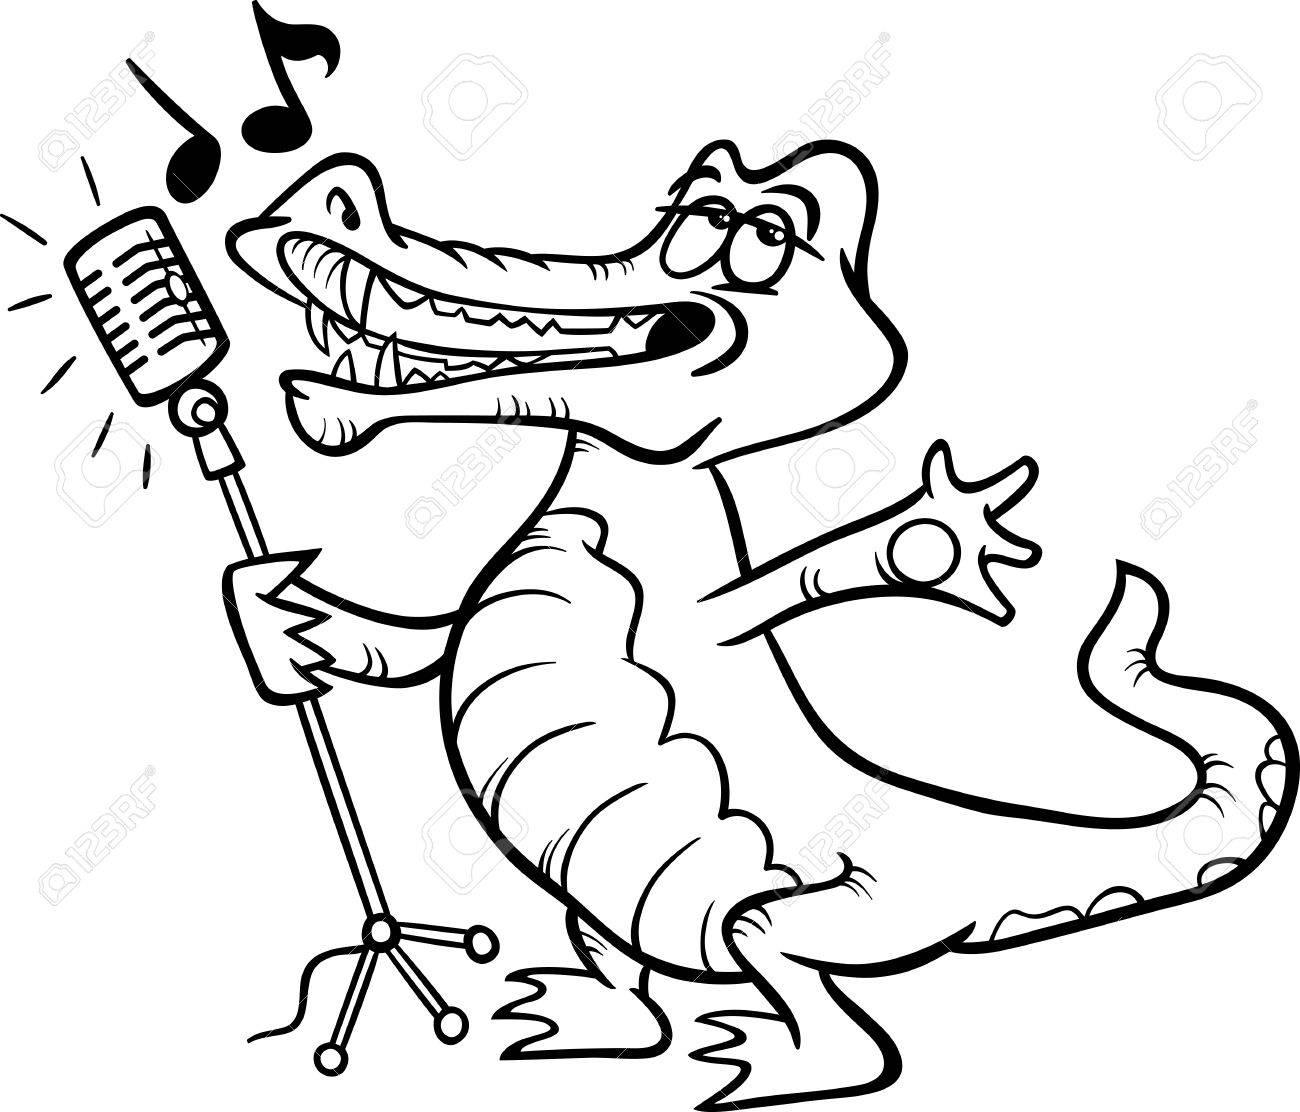 1300x1112 Black And White Cartoon Illustration Of Funny Singing Crocodile